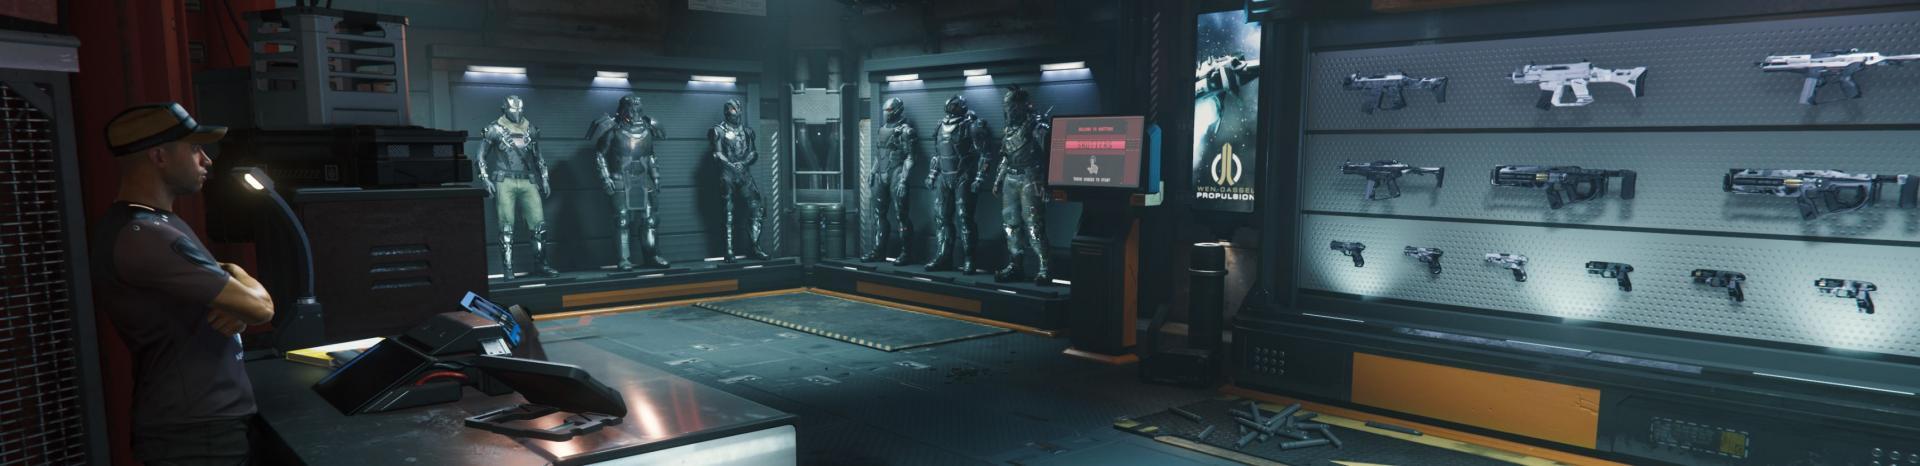 Armor_22R.thumb.JPG.6965492549dd1d30c13266cb3b5bfae7.JPG